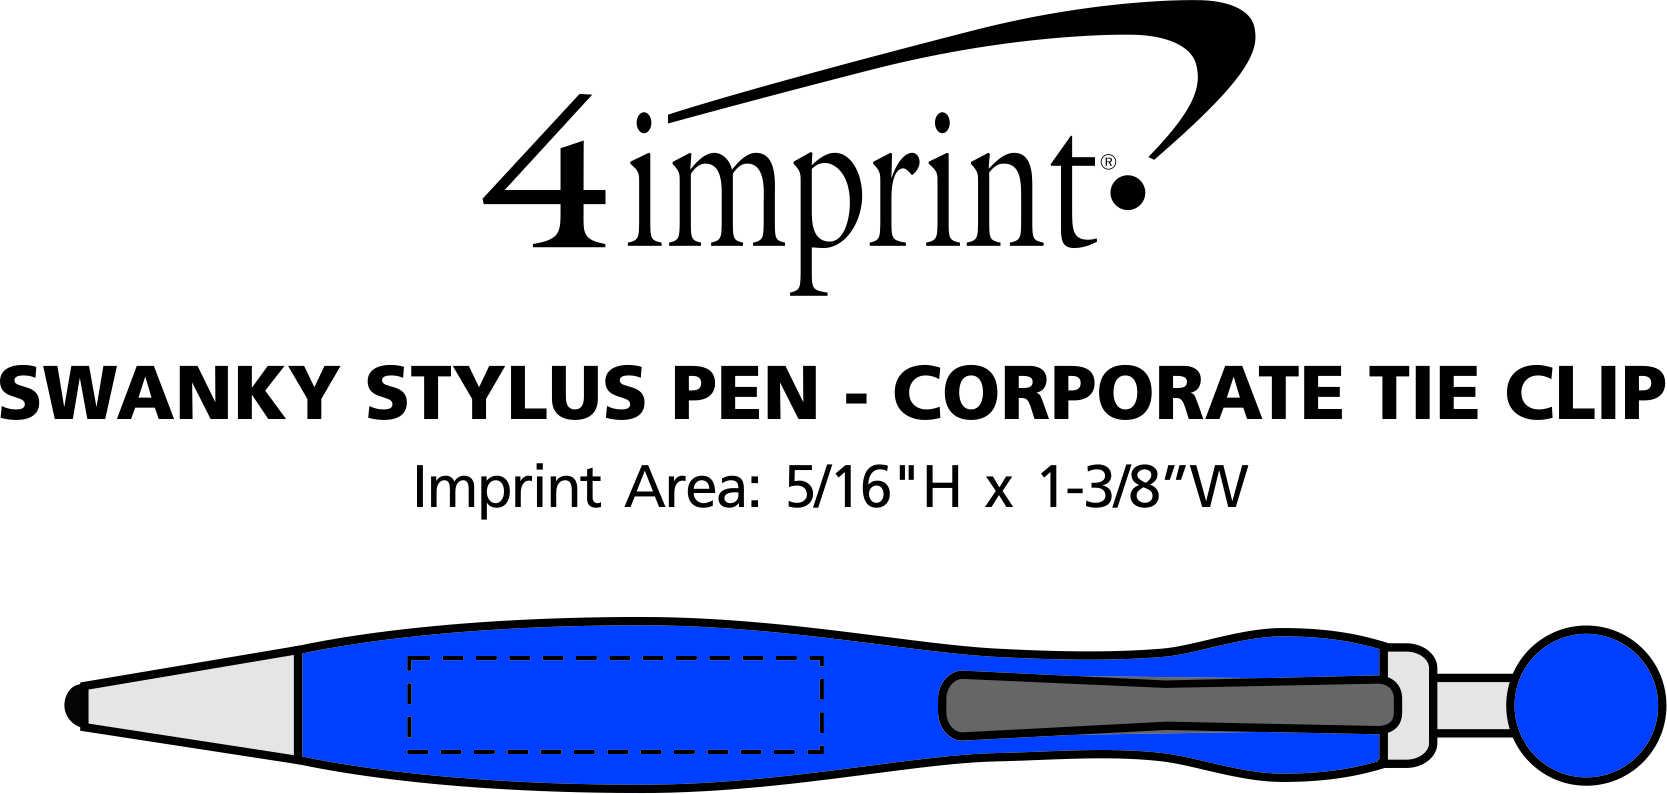 Imprint Area of Swanky Stylus Pen - Corporate Tie